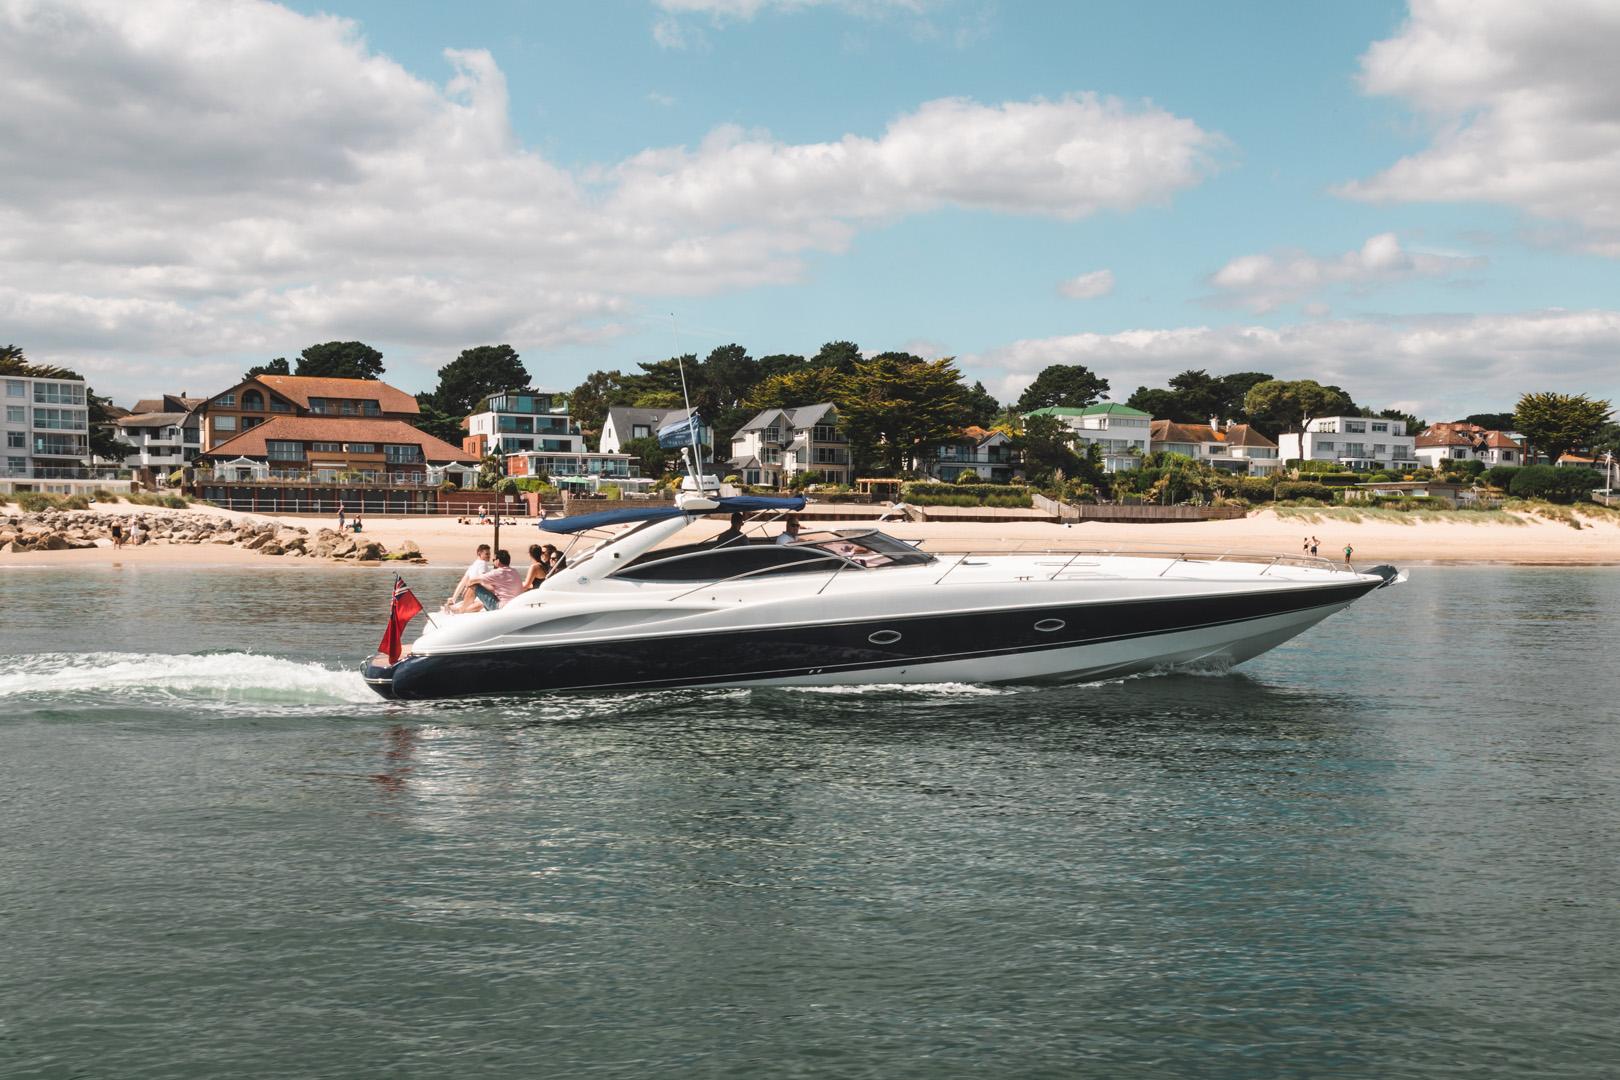 Shot alongside a speed boat jetting off from sandbanks beach in Poole